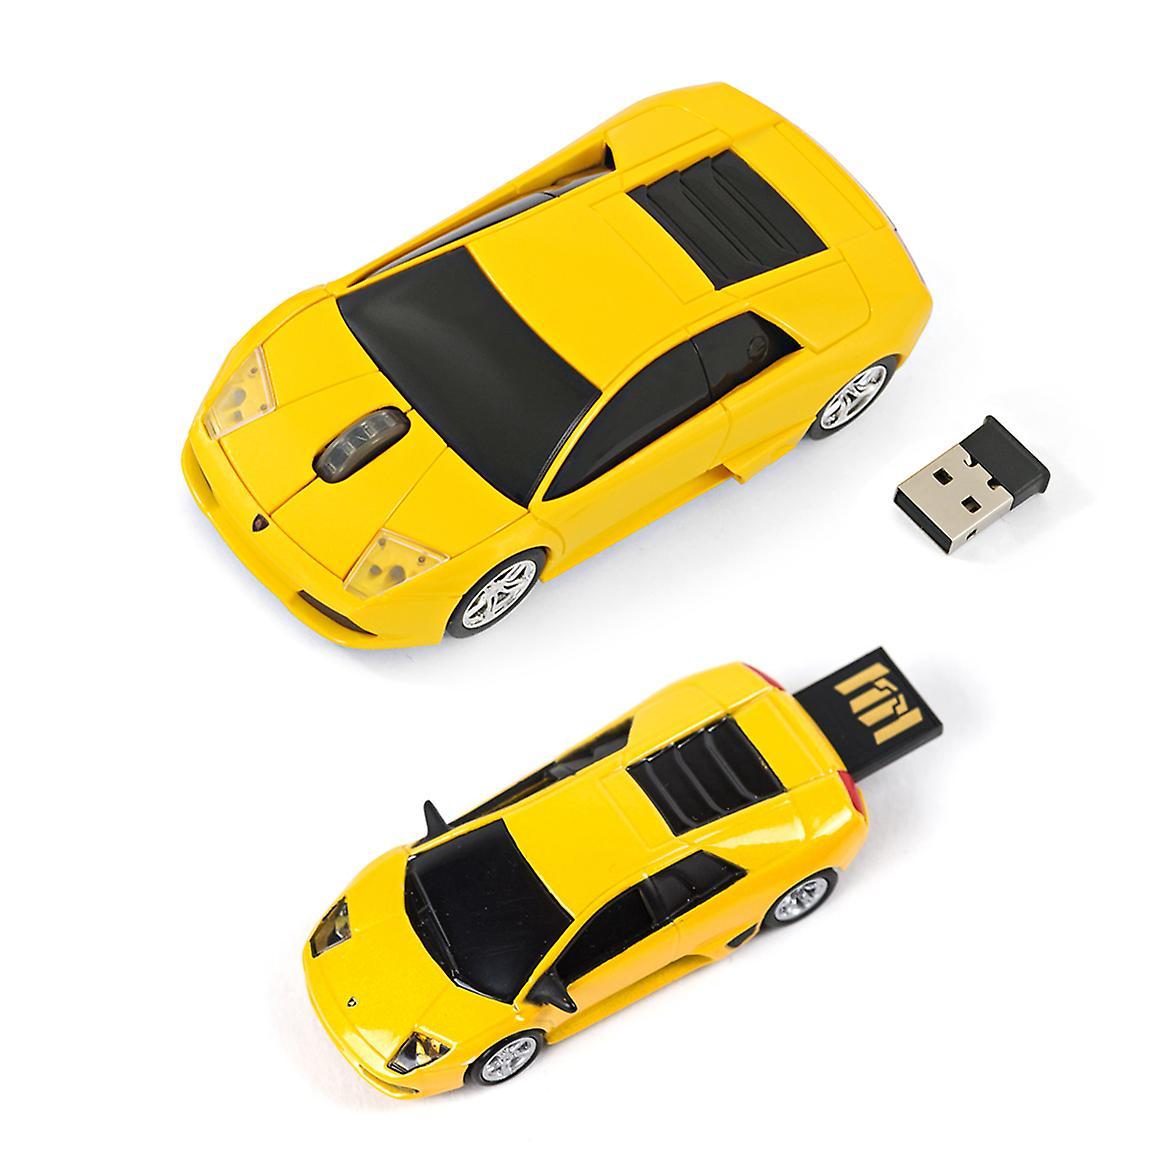 Official Lamborghini Murceilago Wireless Mouse + USB 4Gb Memory Stick Gift Set